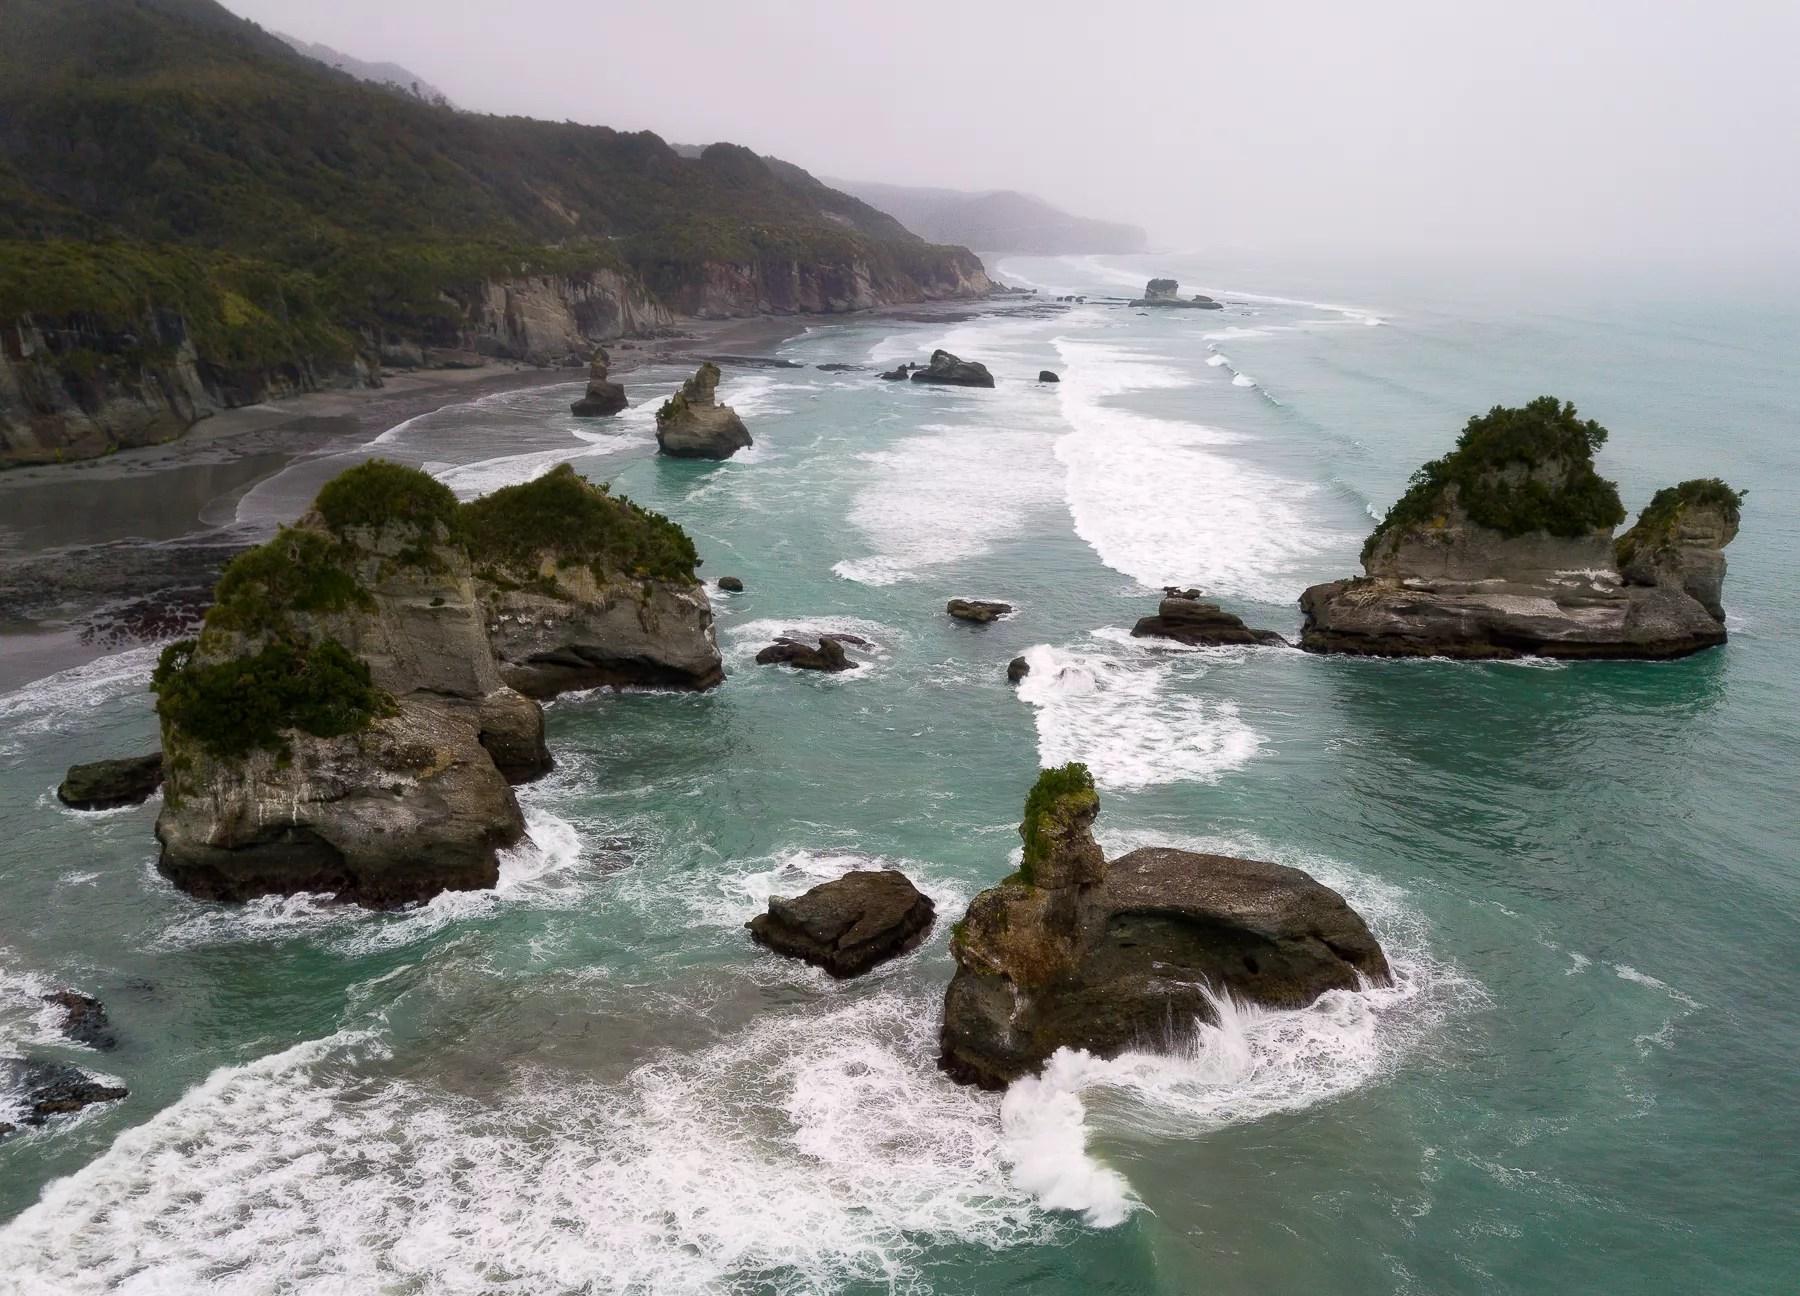 Motukiekie Beach on an overcast day